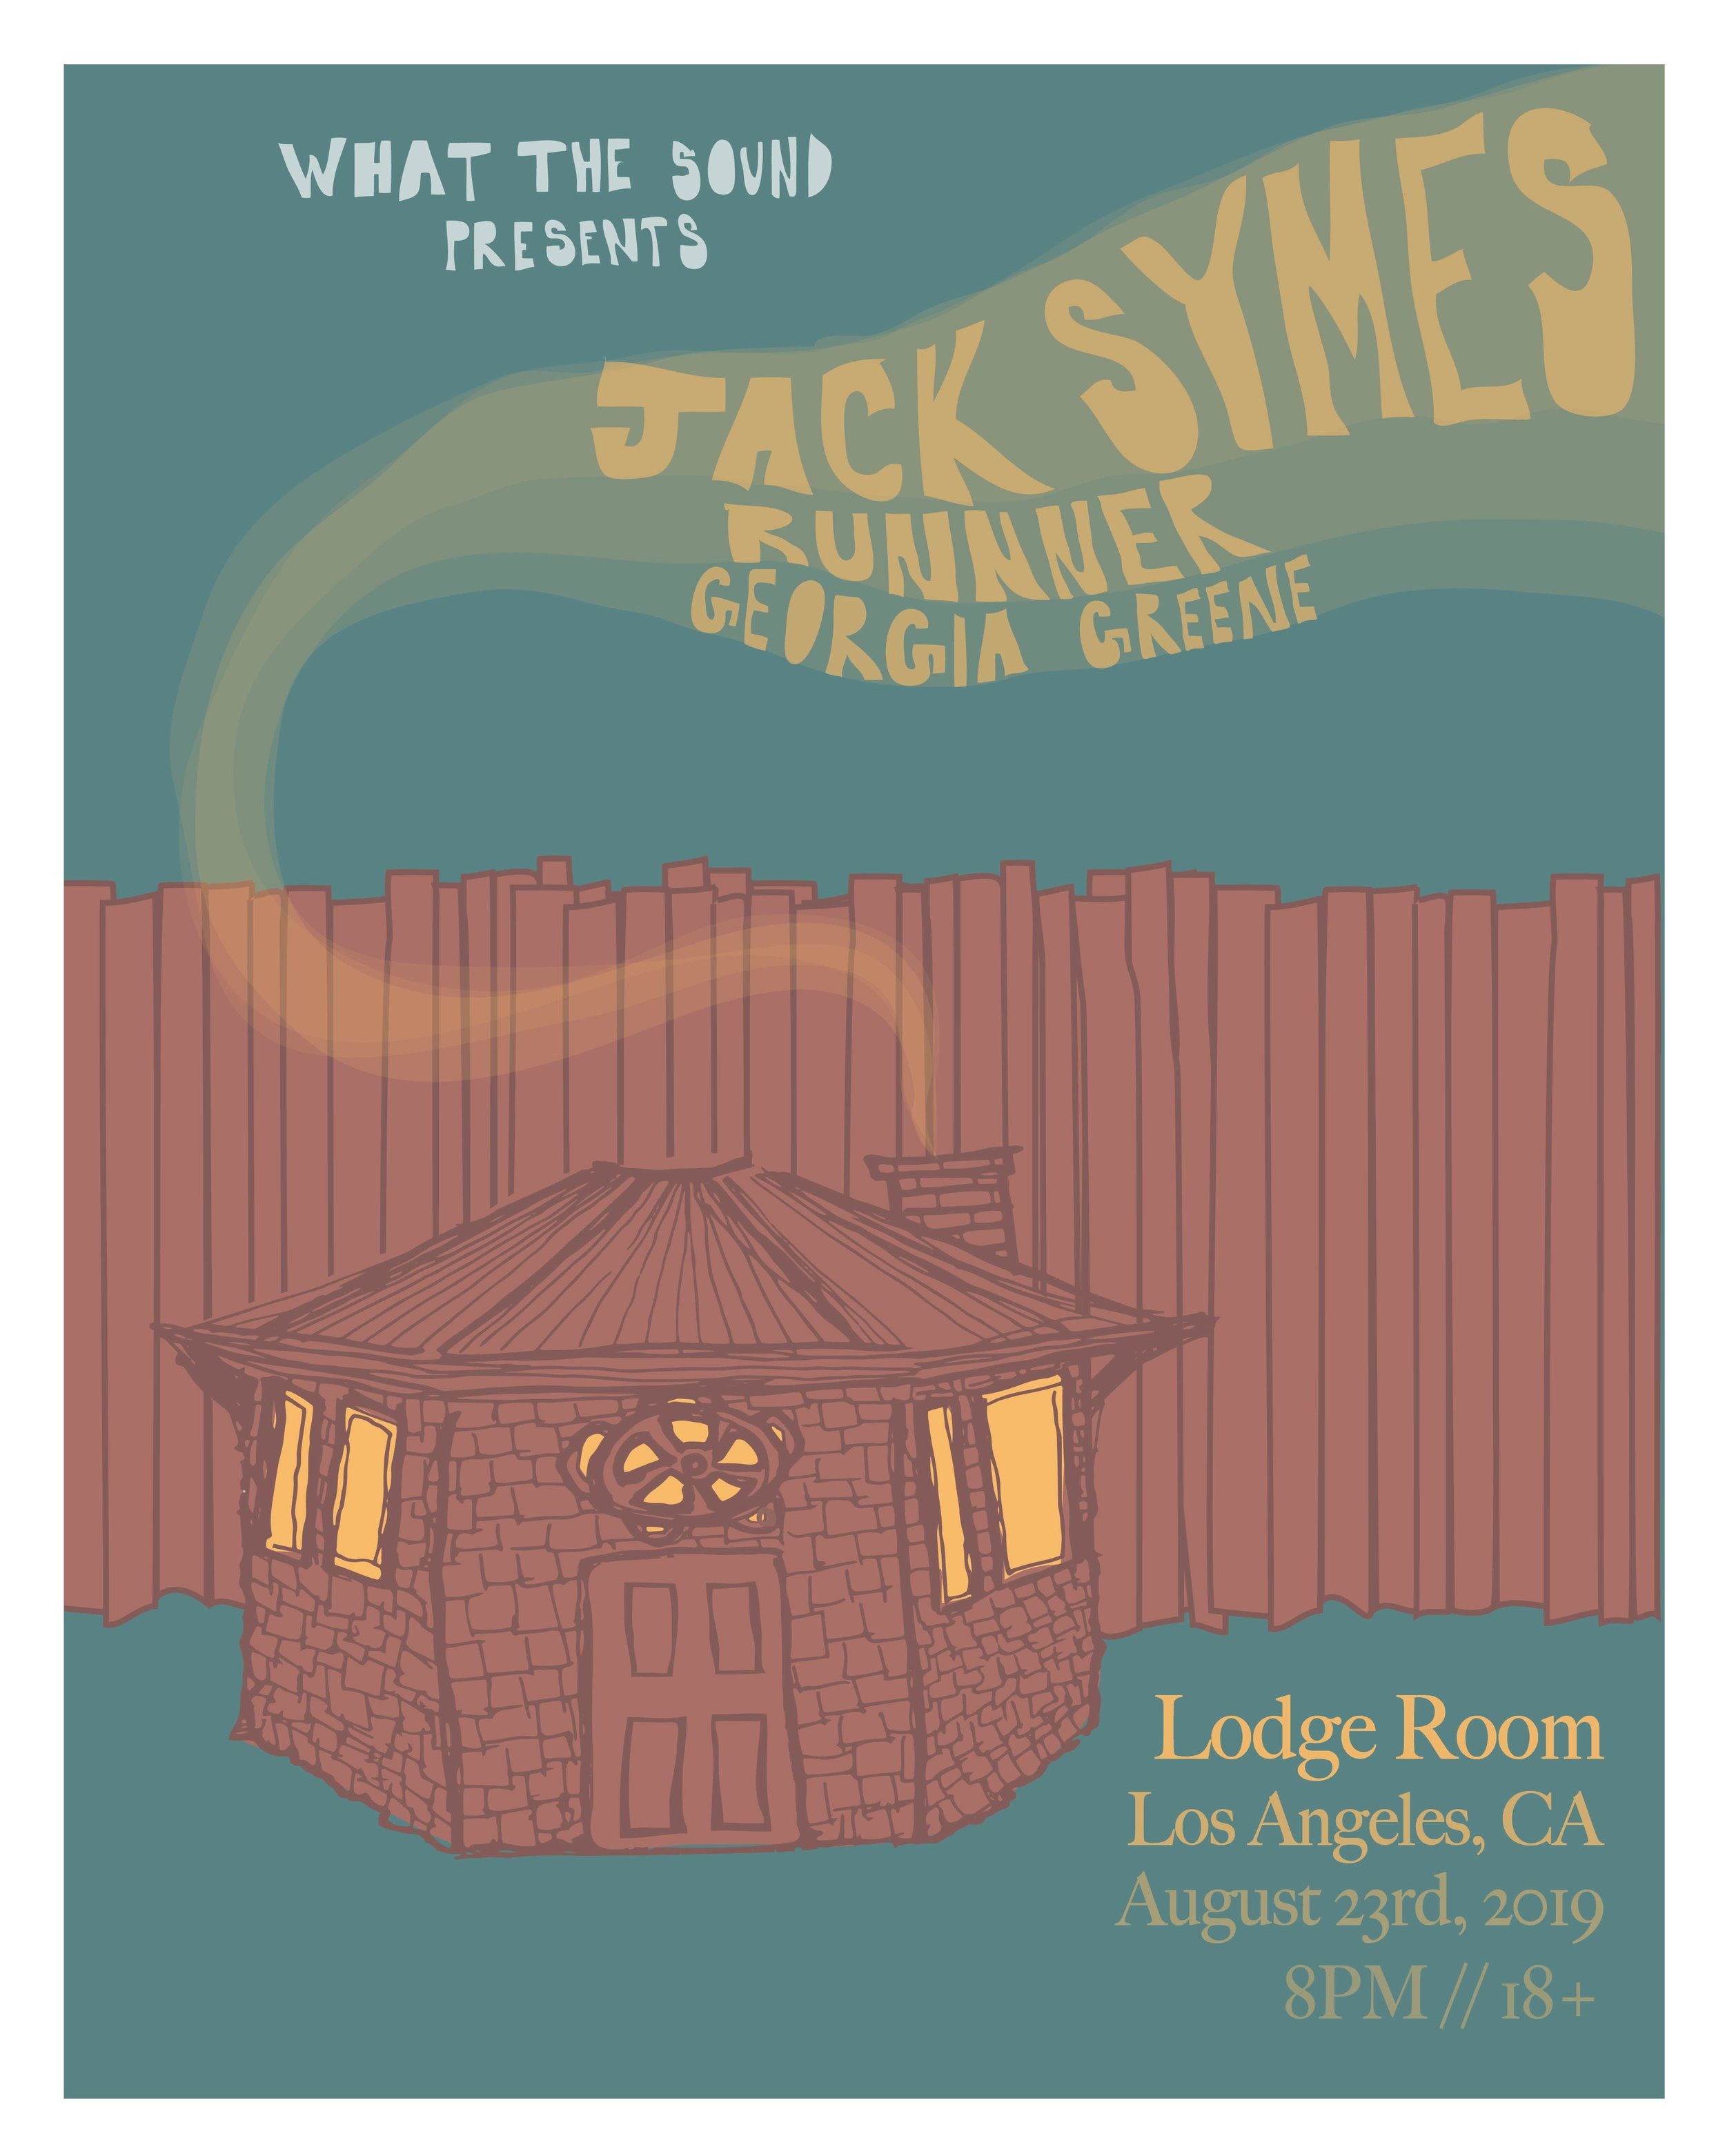 Symes_Lodge Room_LA 12x15 (1).jpg